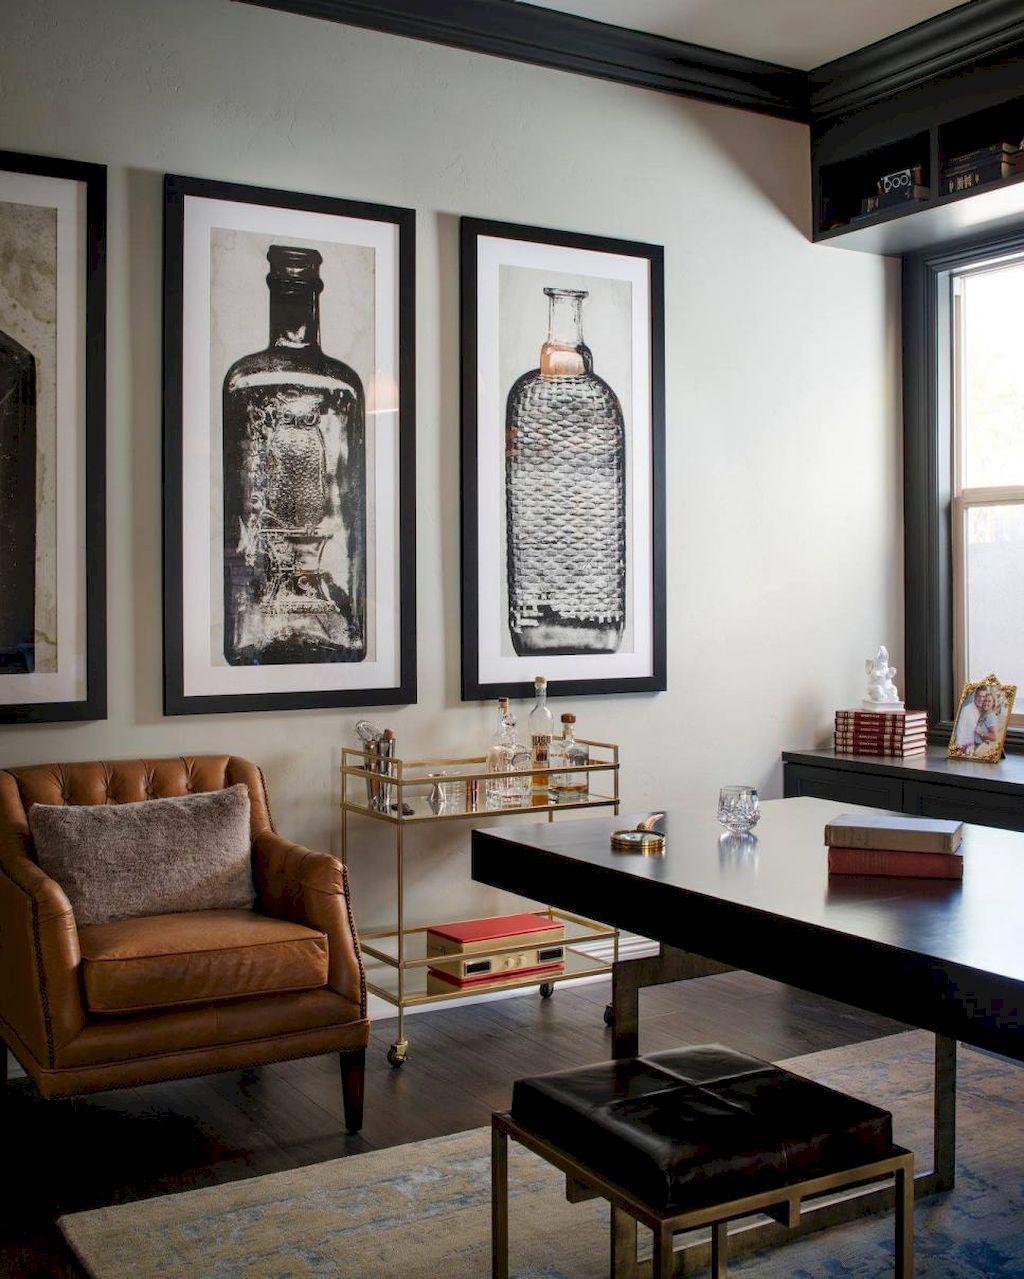 70 Simple Home Office Decor Ideas for Men | Idea man, Office designs ...